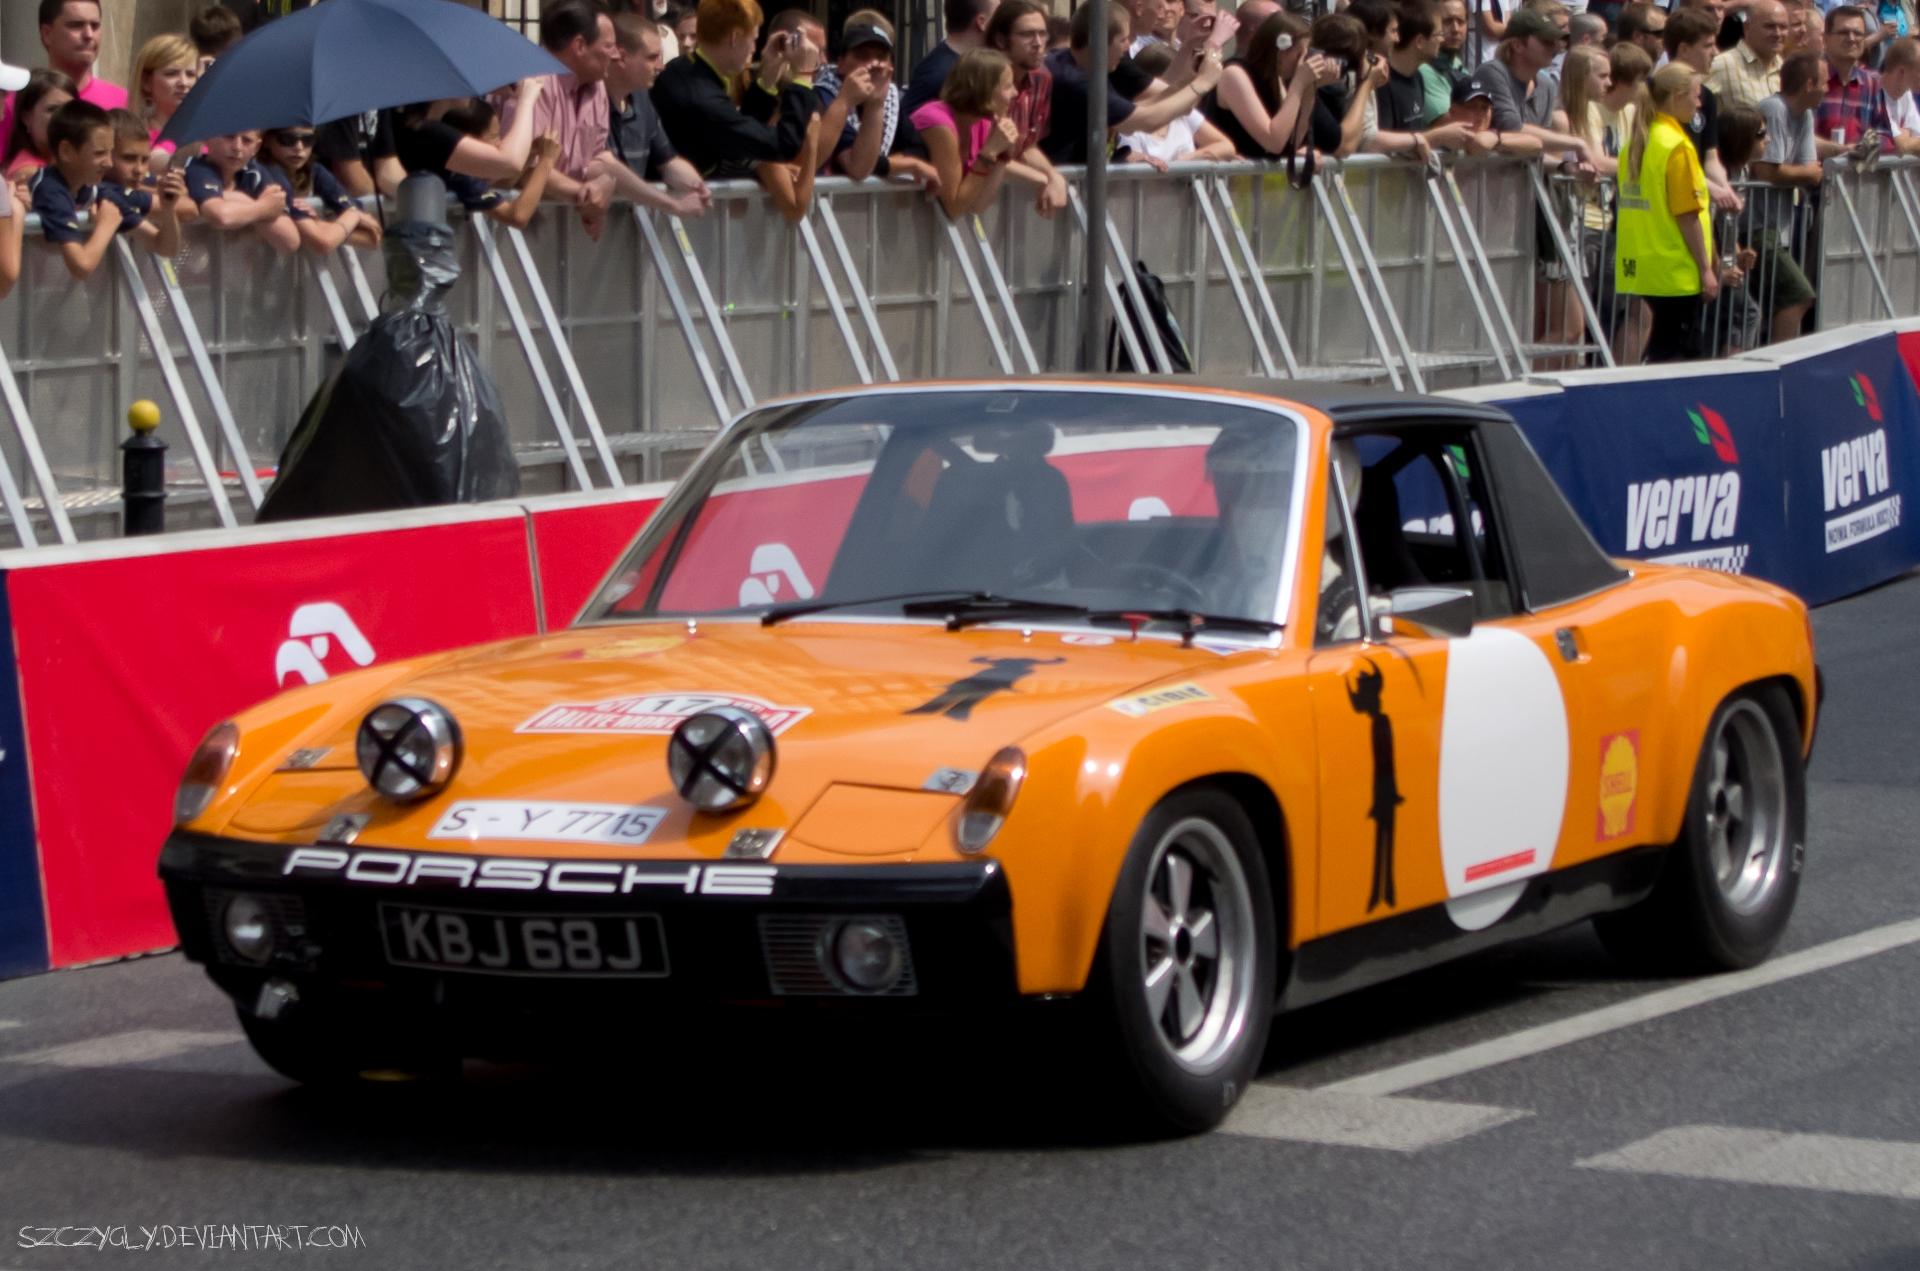 Craigslist Race Cars Rollers